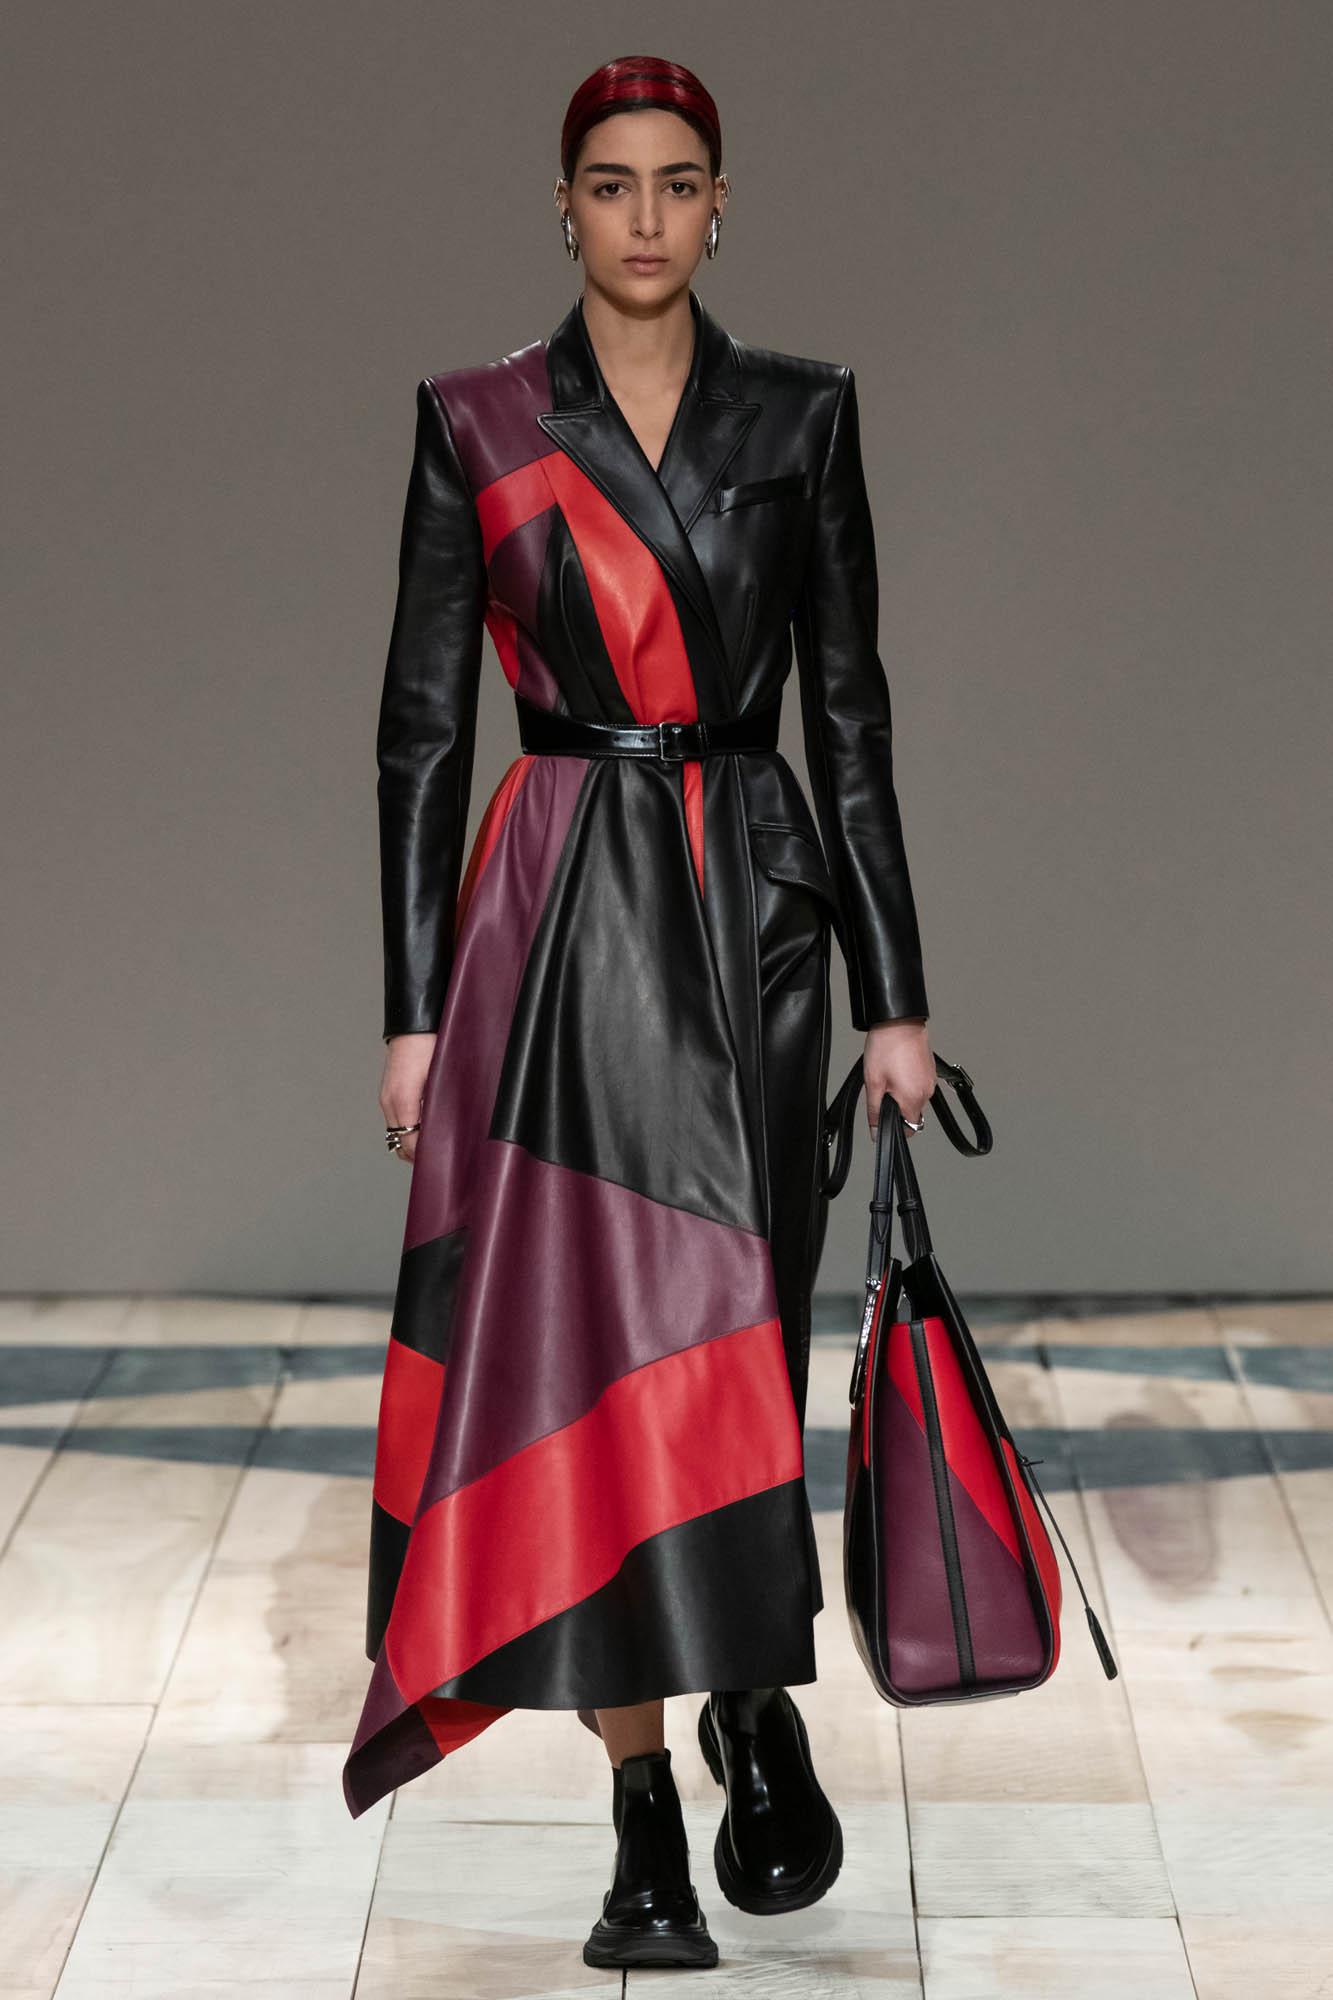 Fashion Model Alexander McQueen Catwalk